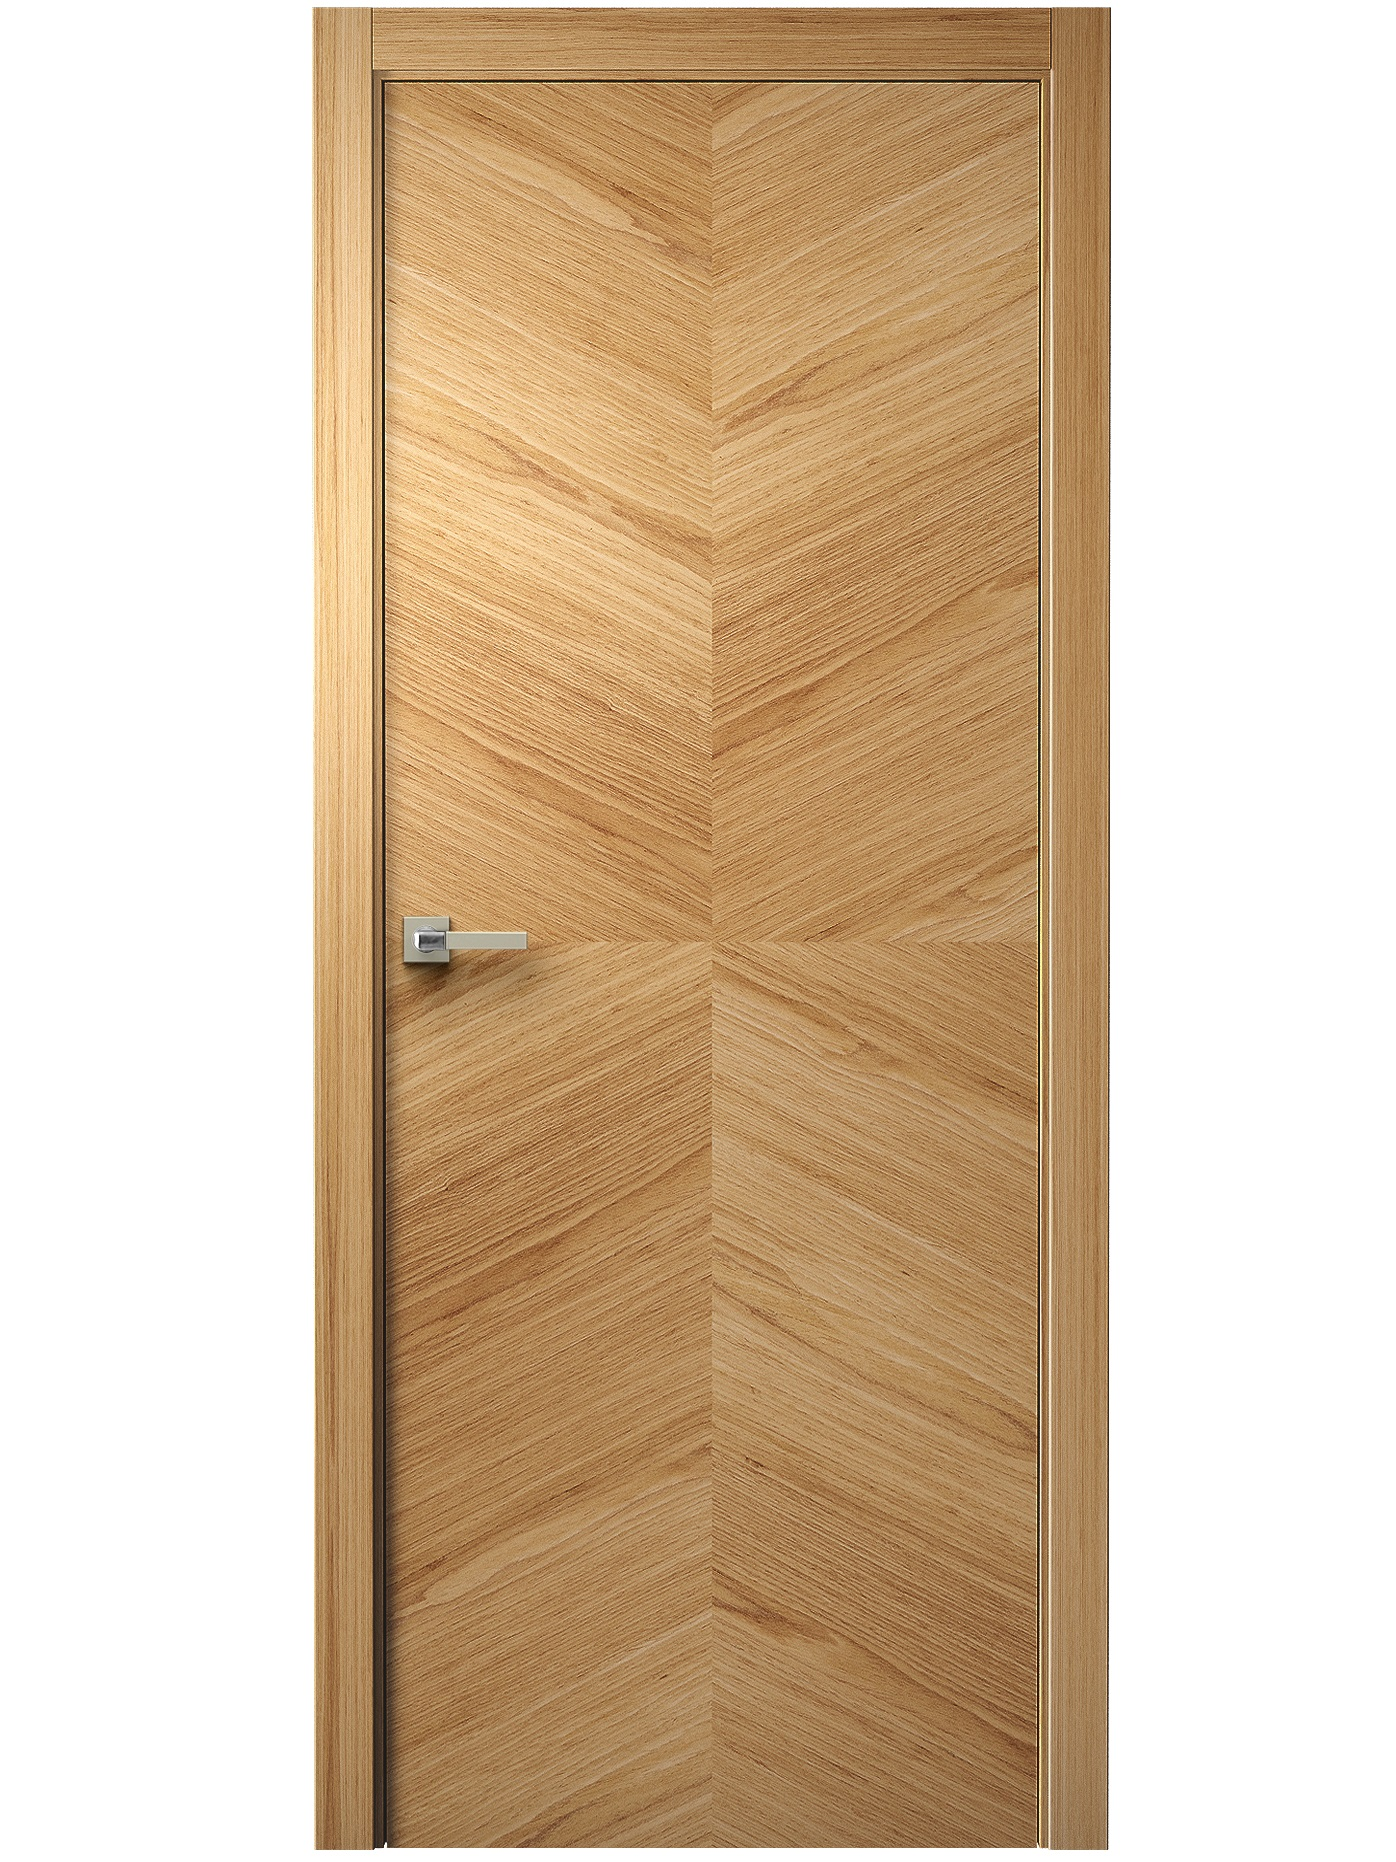 Image Tera X Interior Door Natural Oak 0